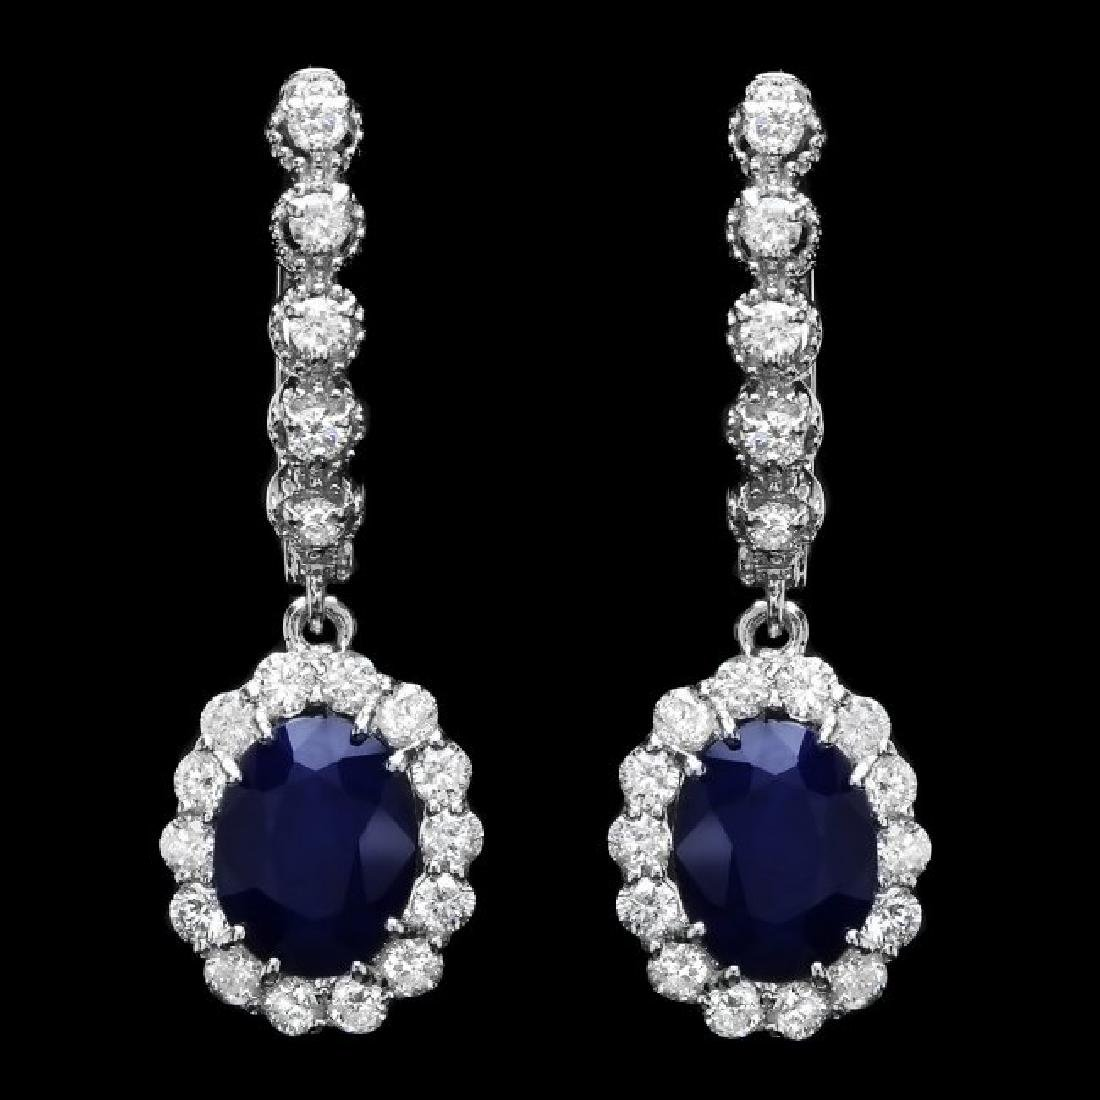 14k Gold 5.00ct Sapphire 1.35ct Diamond Earrings